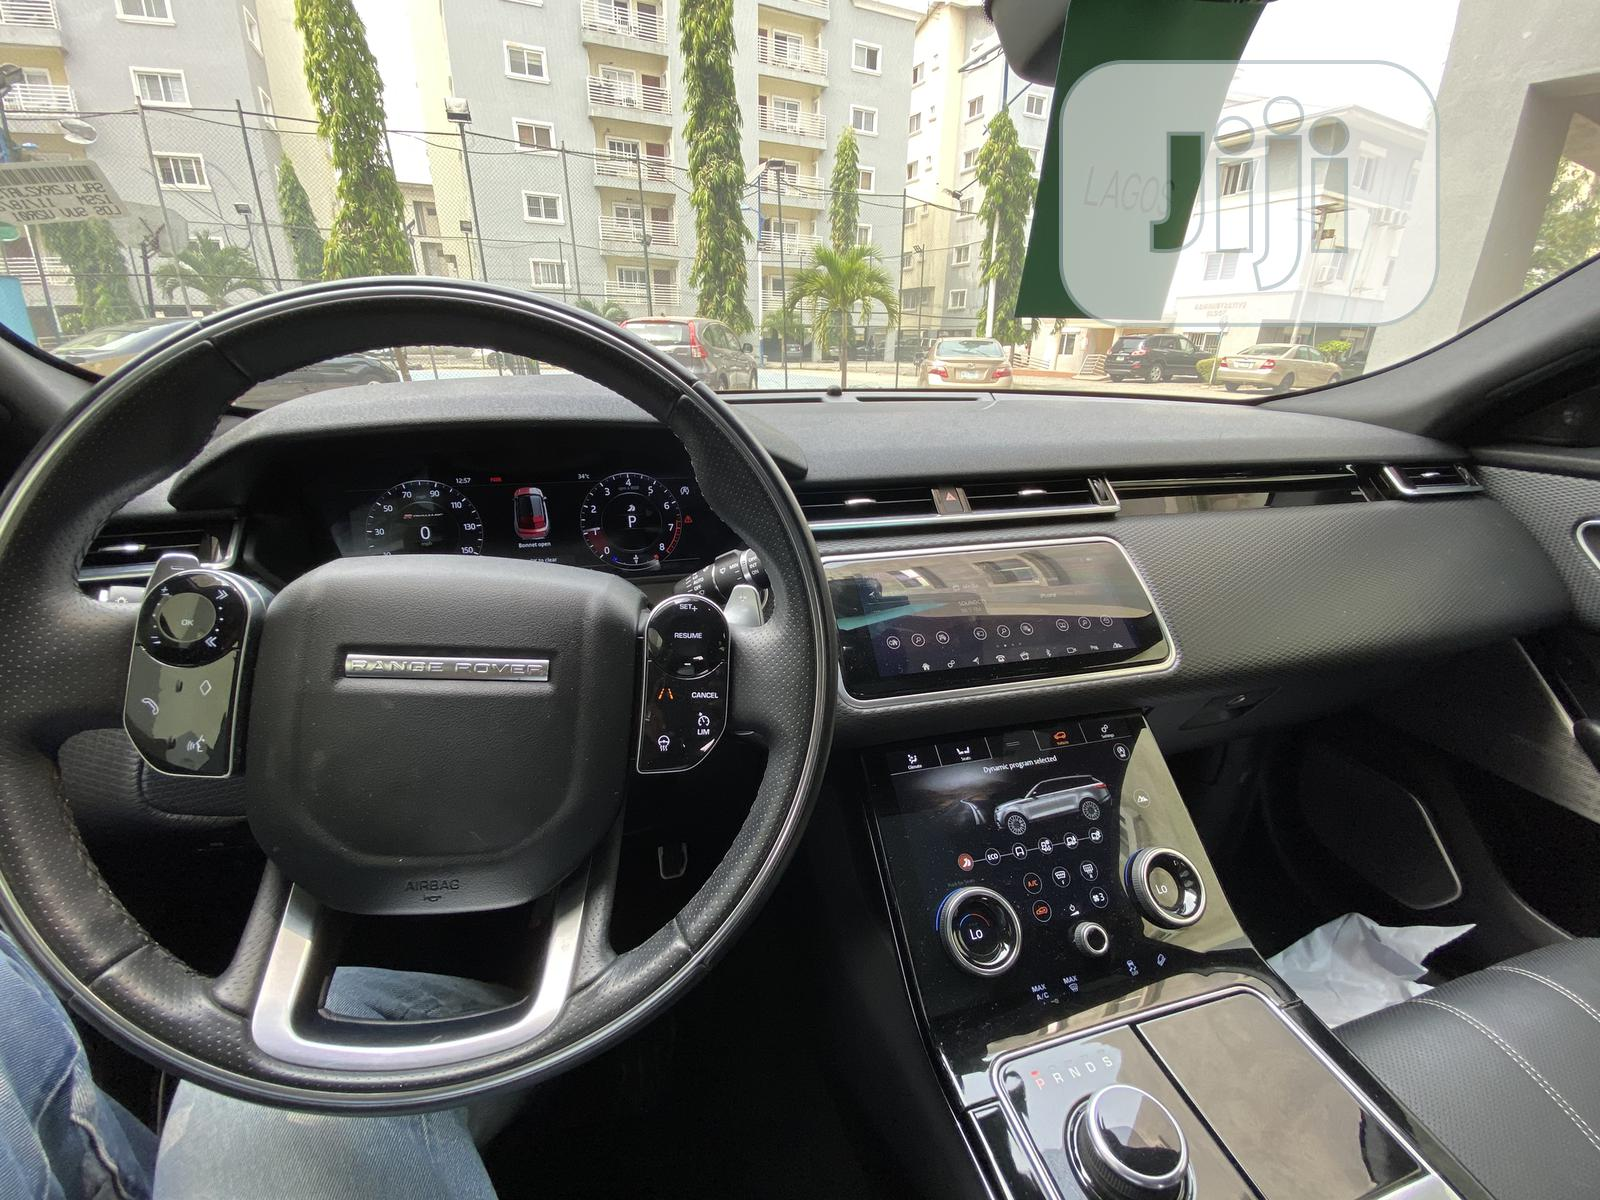 Land Rover Range Rover Velar 2018 P250 SE R-Dynamic 4x4 White | Cars for sale in Lekki, Lagos State, Nigeria